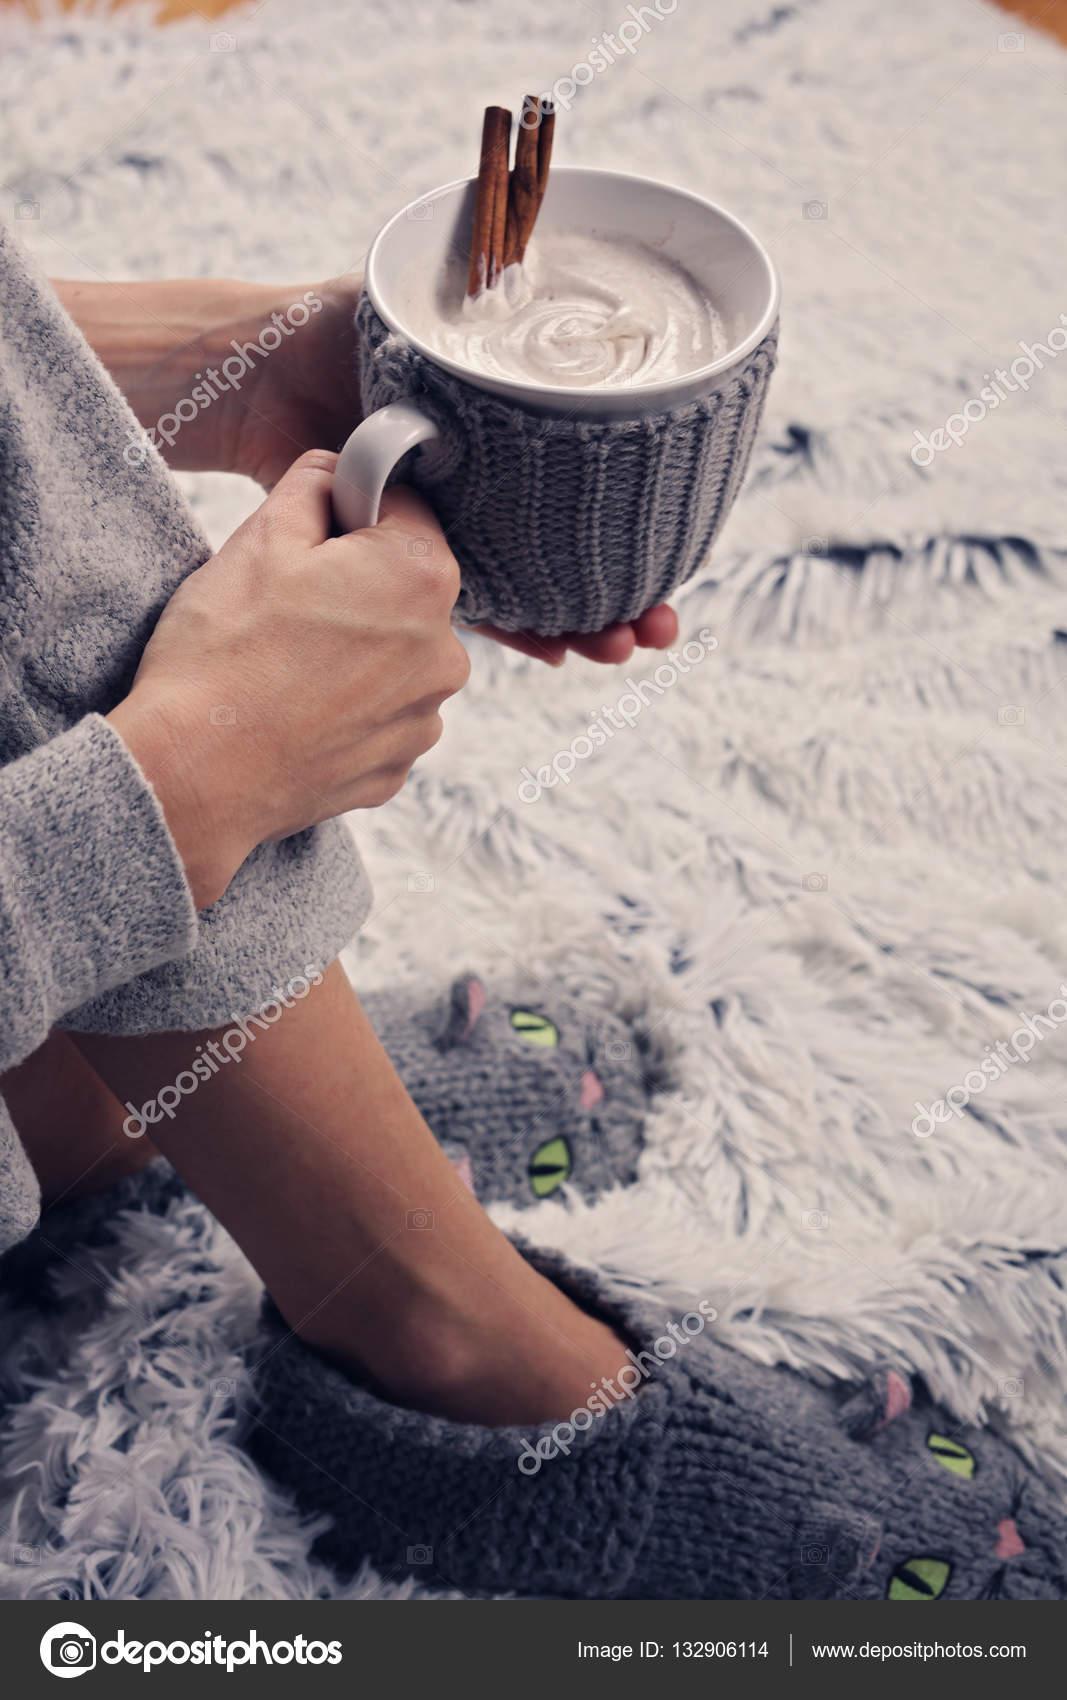 a8d8c83a98e2 Γυναίκα που φοράει φιλόξενο ζεστό μαλλί κάλτσες και πίνοντας κακάο ...